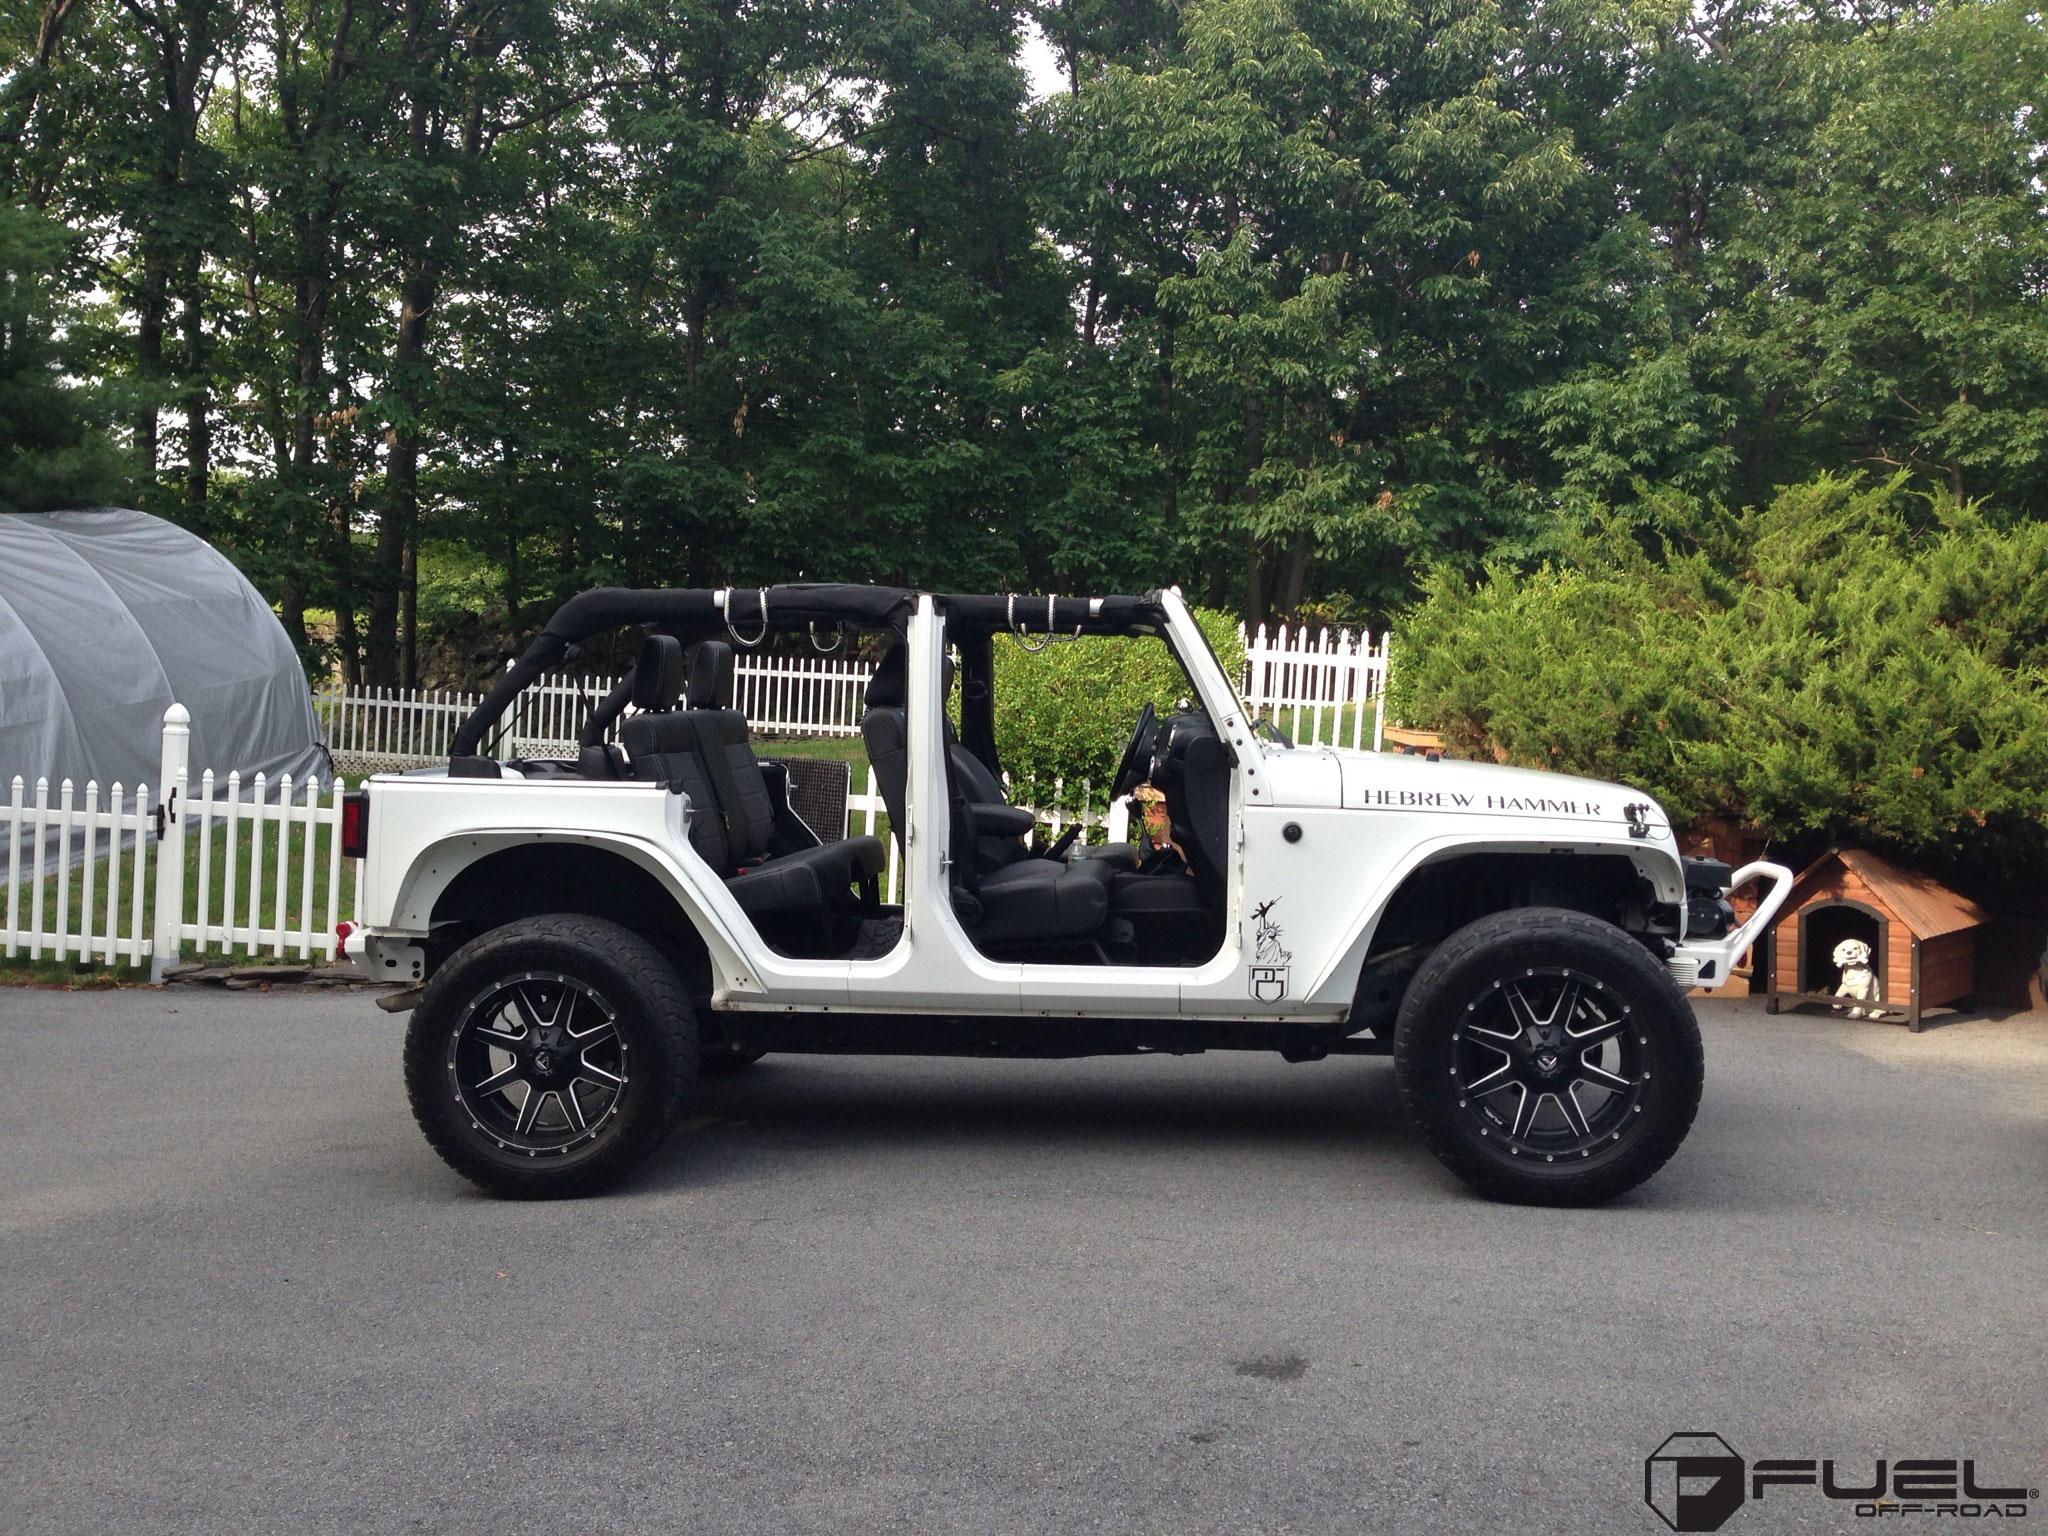 Jeep Wrangler Maverick D262 Gallery Fuel Off Road Wheels